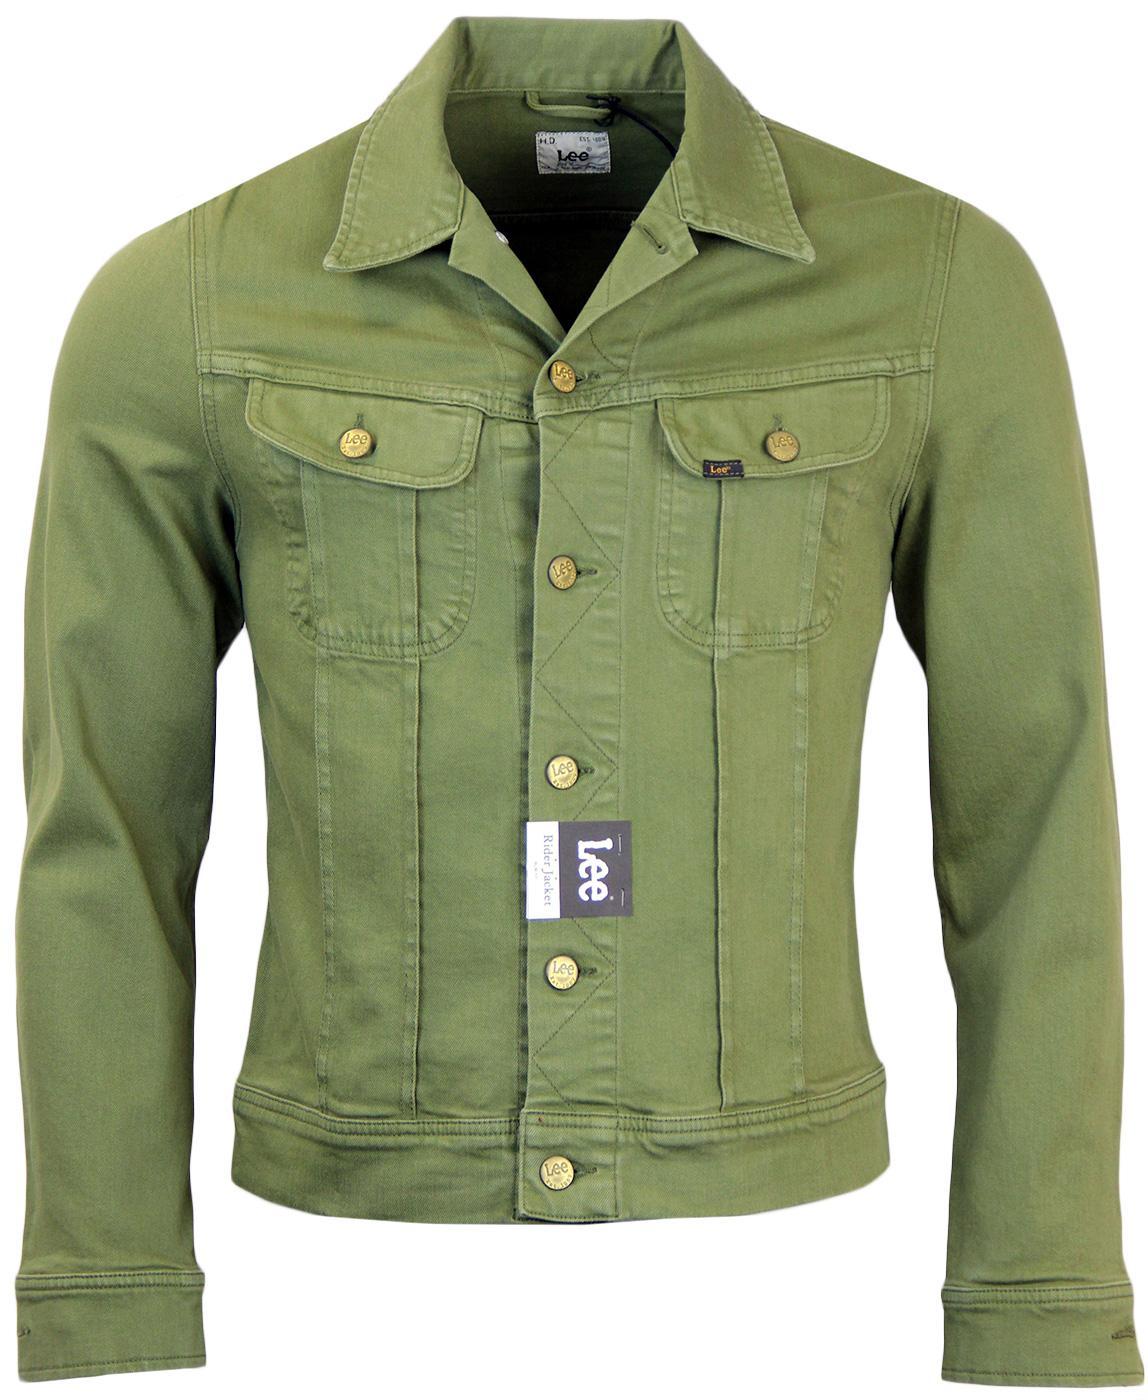 c84cb537b61 LEE Rider Retro 60s Mod Slim Fit Denim Jacket in Green